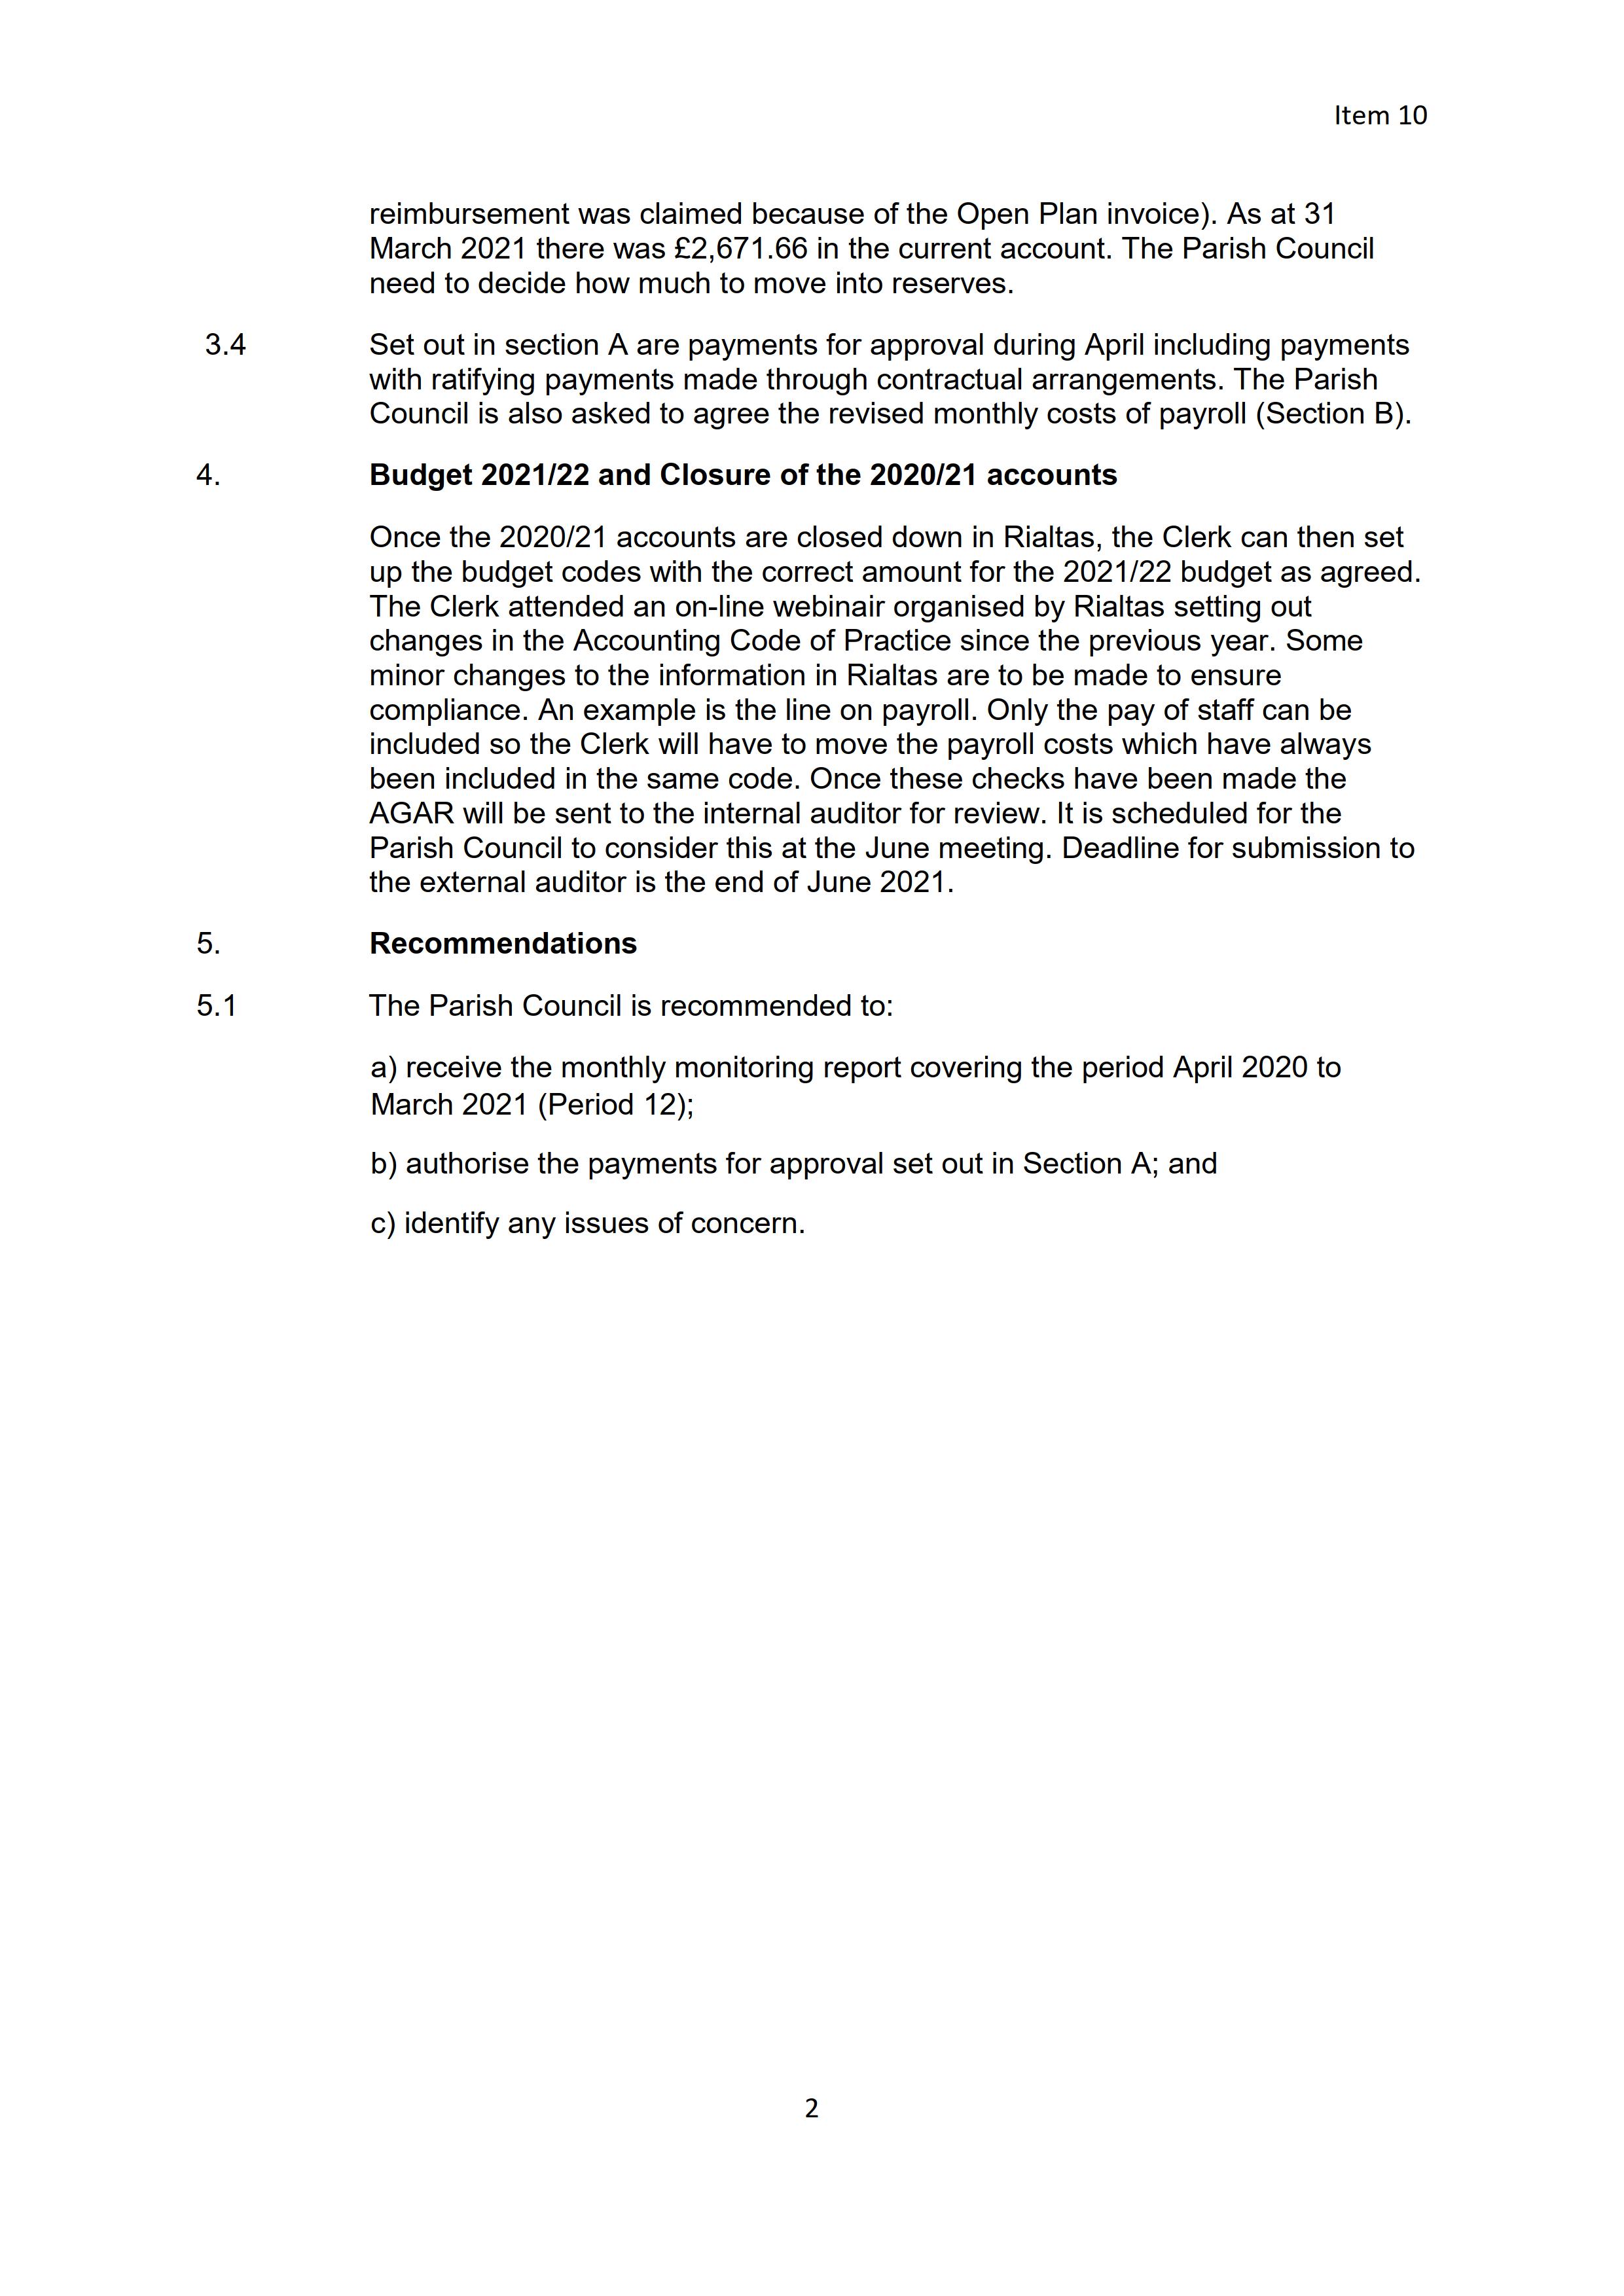 Item_15_Budget_Monitoring_report_2.png